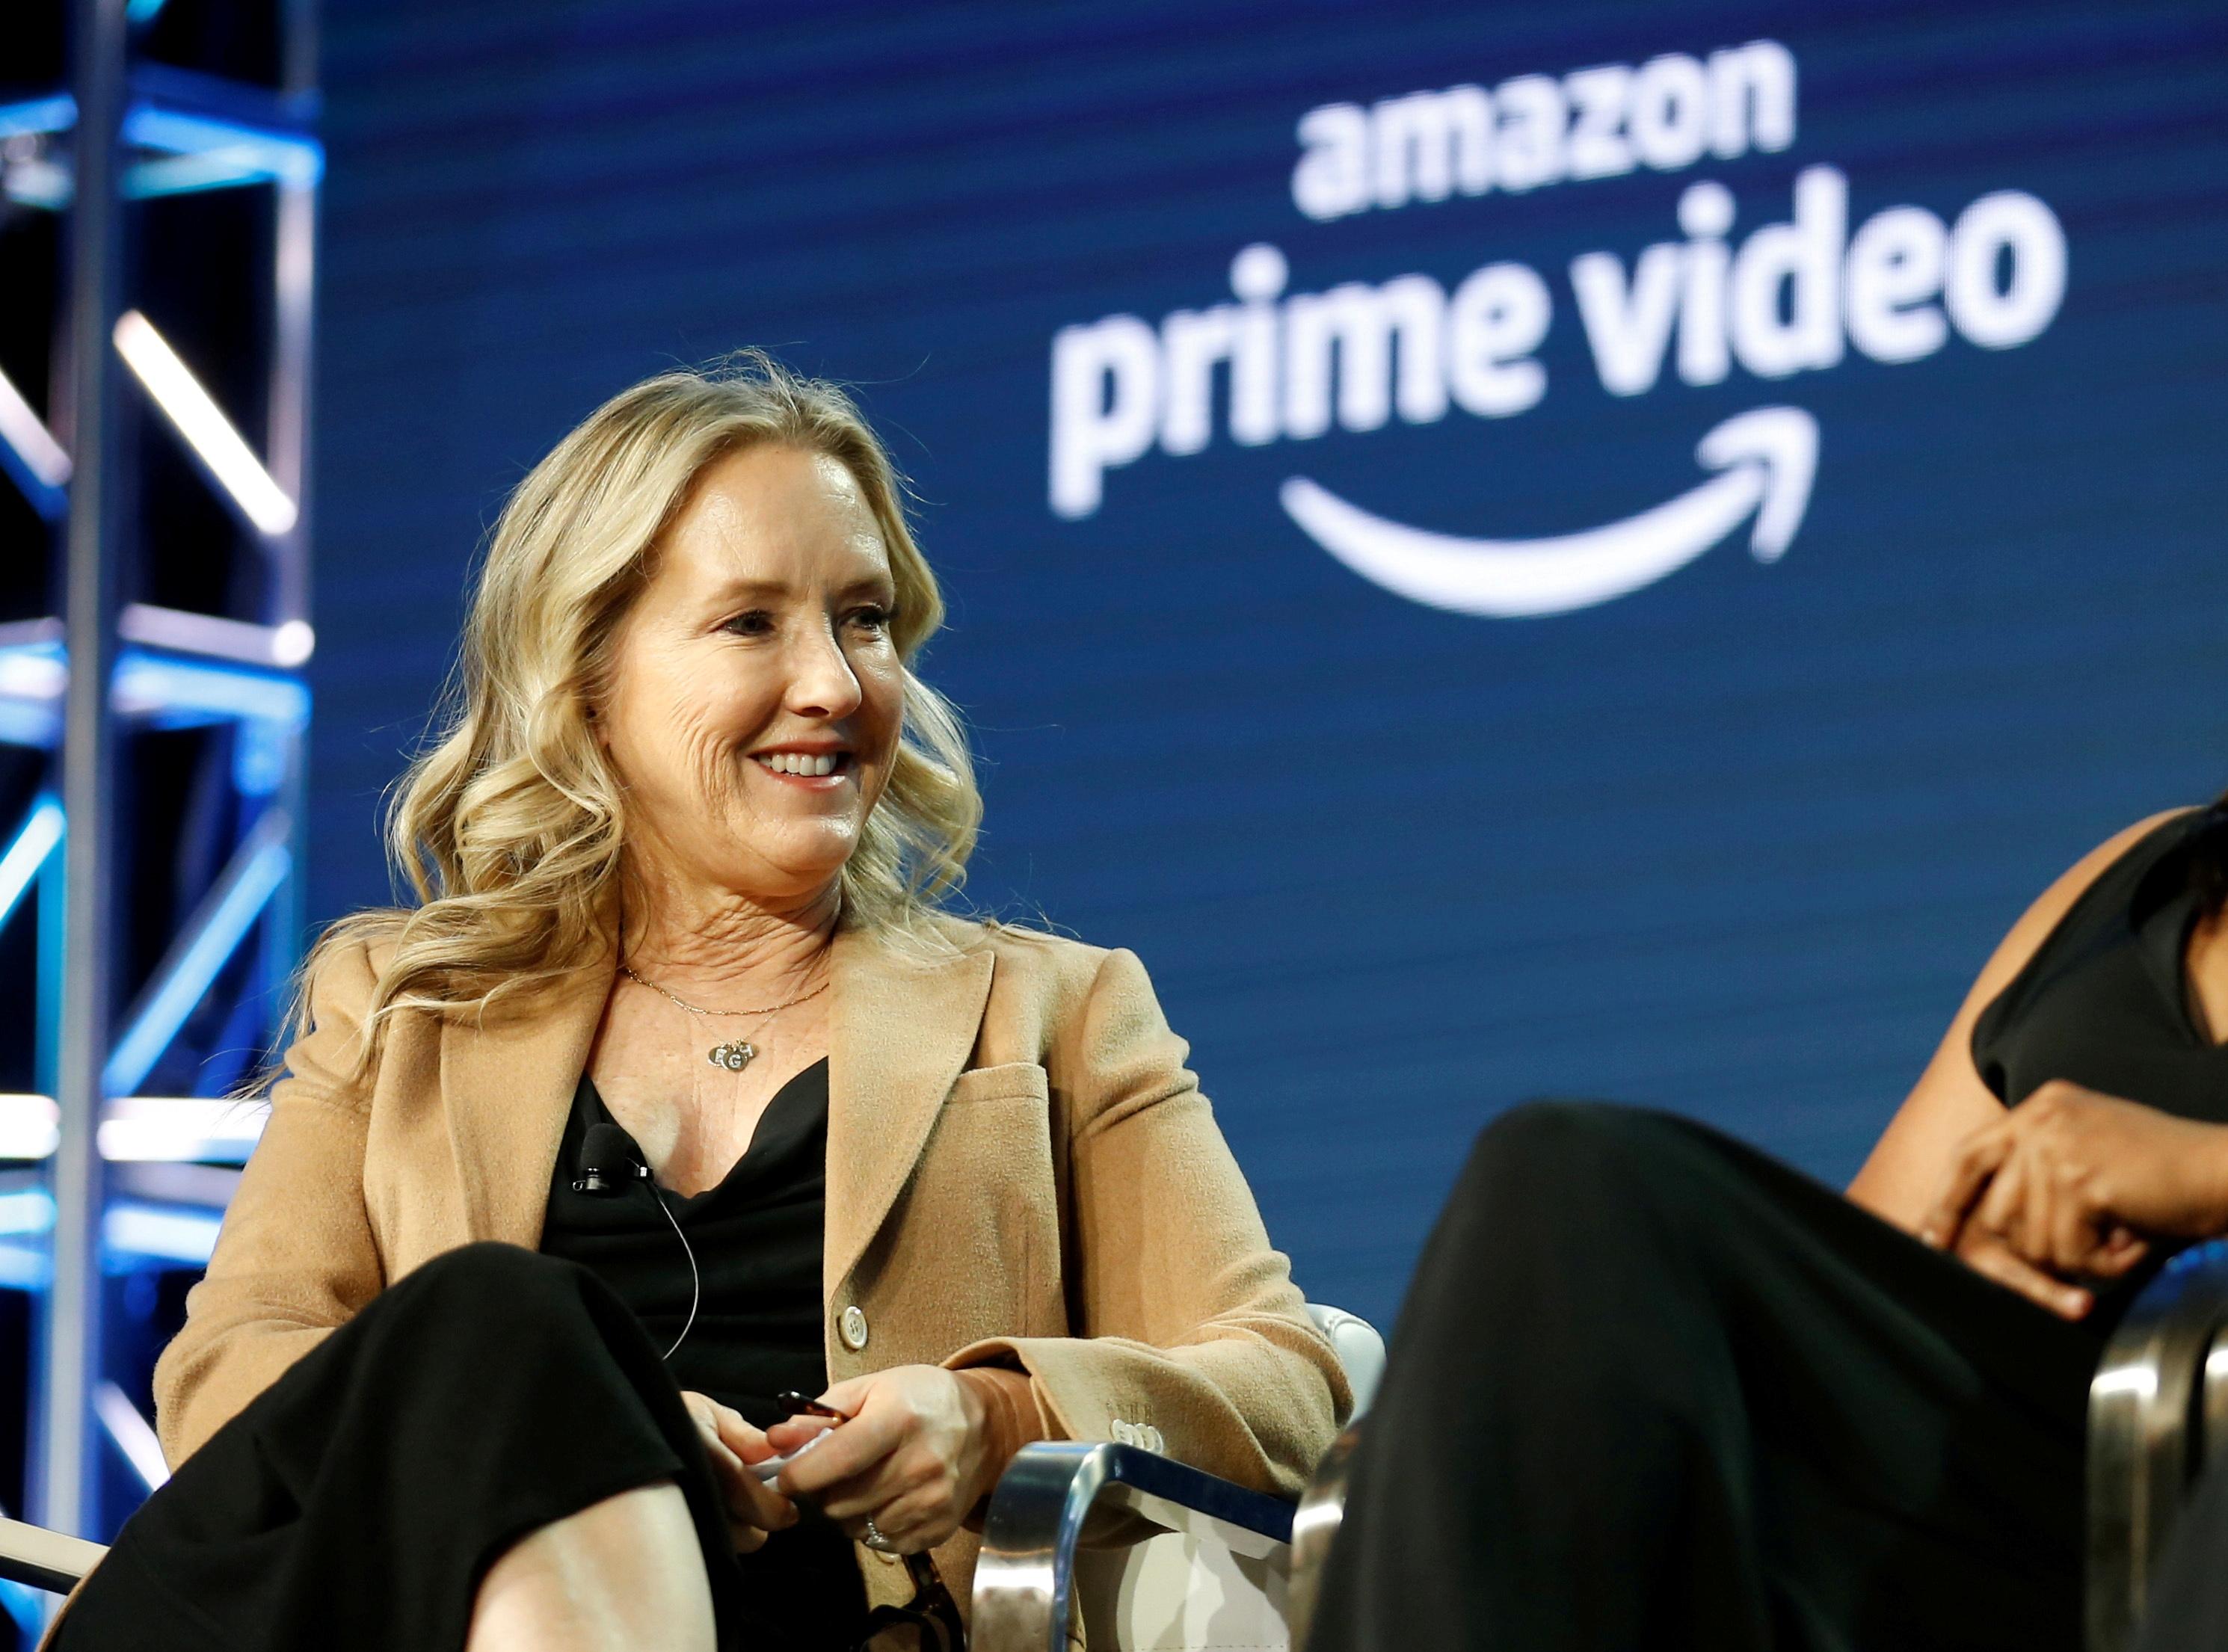 Head of Amazon Studios Jennifer Salke participates in the